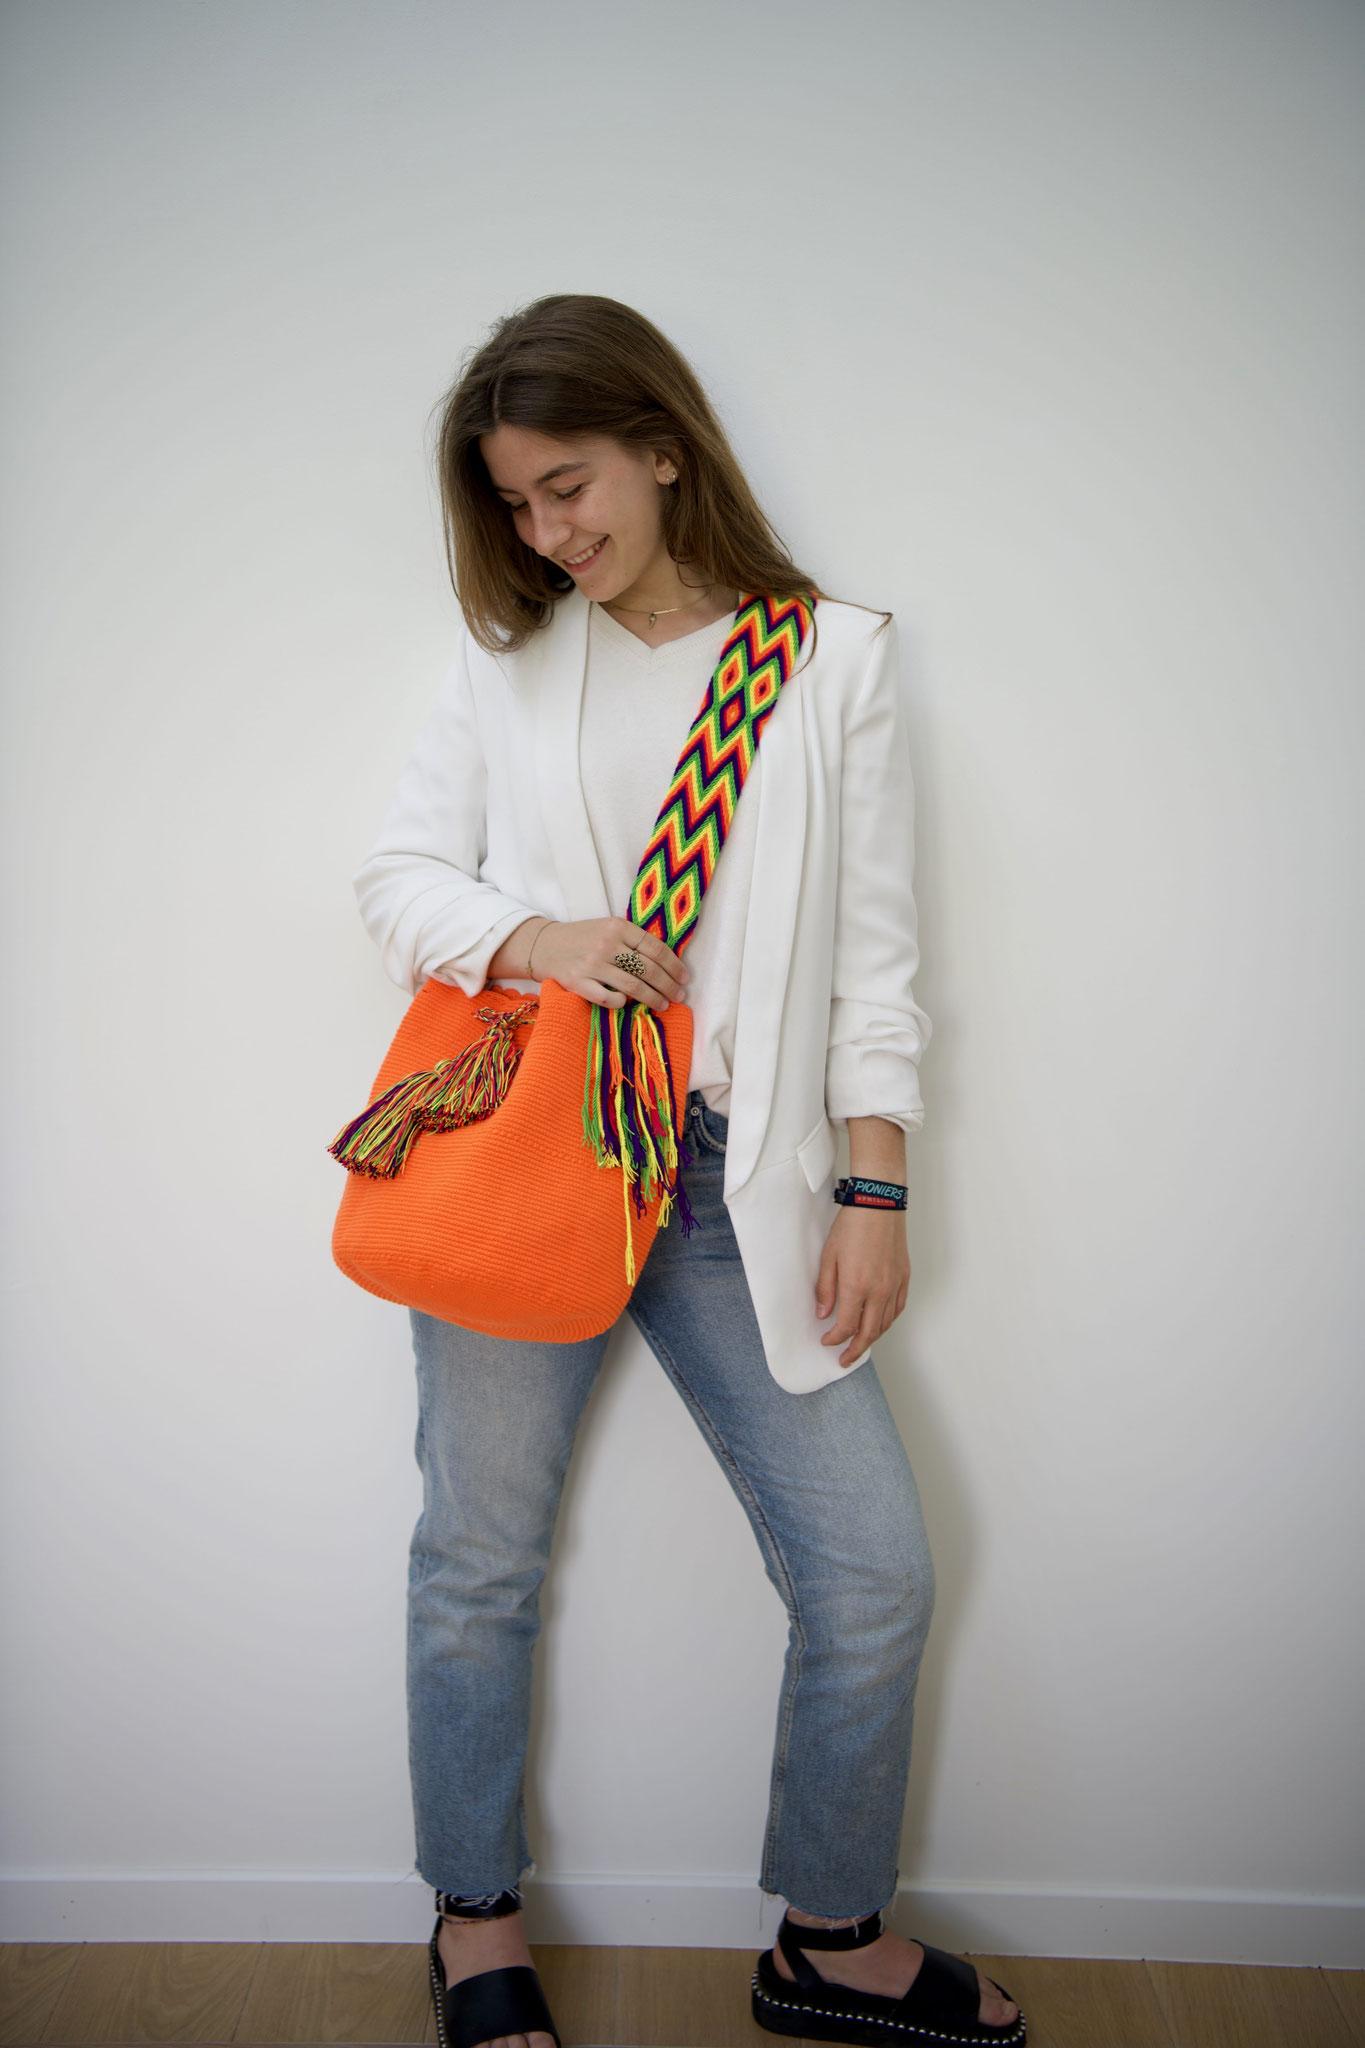 Handcrafted Mochila bags